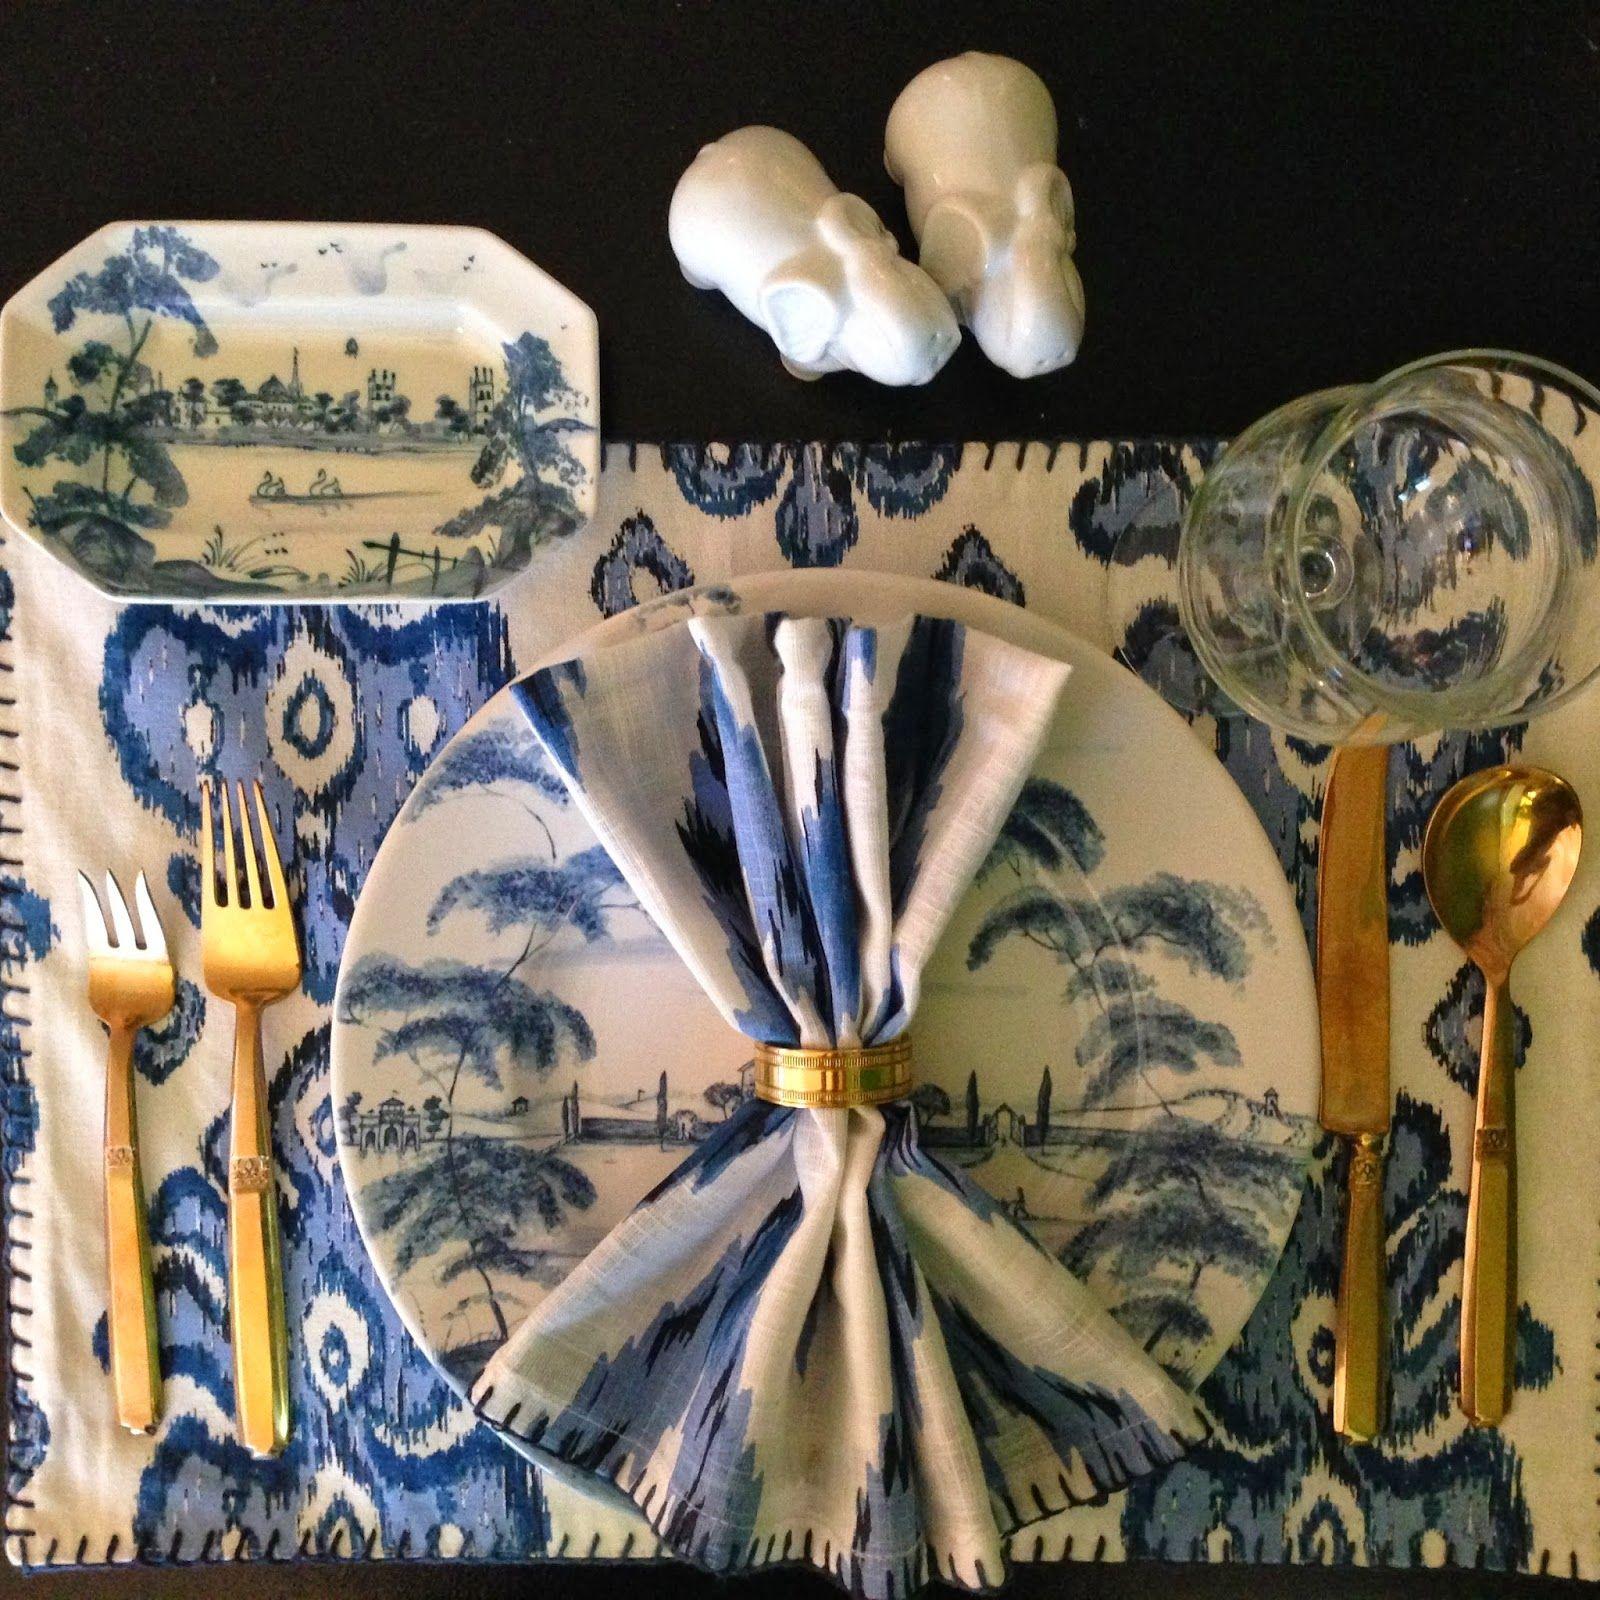 SANITY FAIR, Isis ceramics and World Market ikat linens!